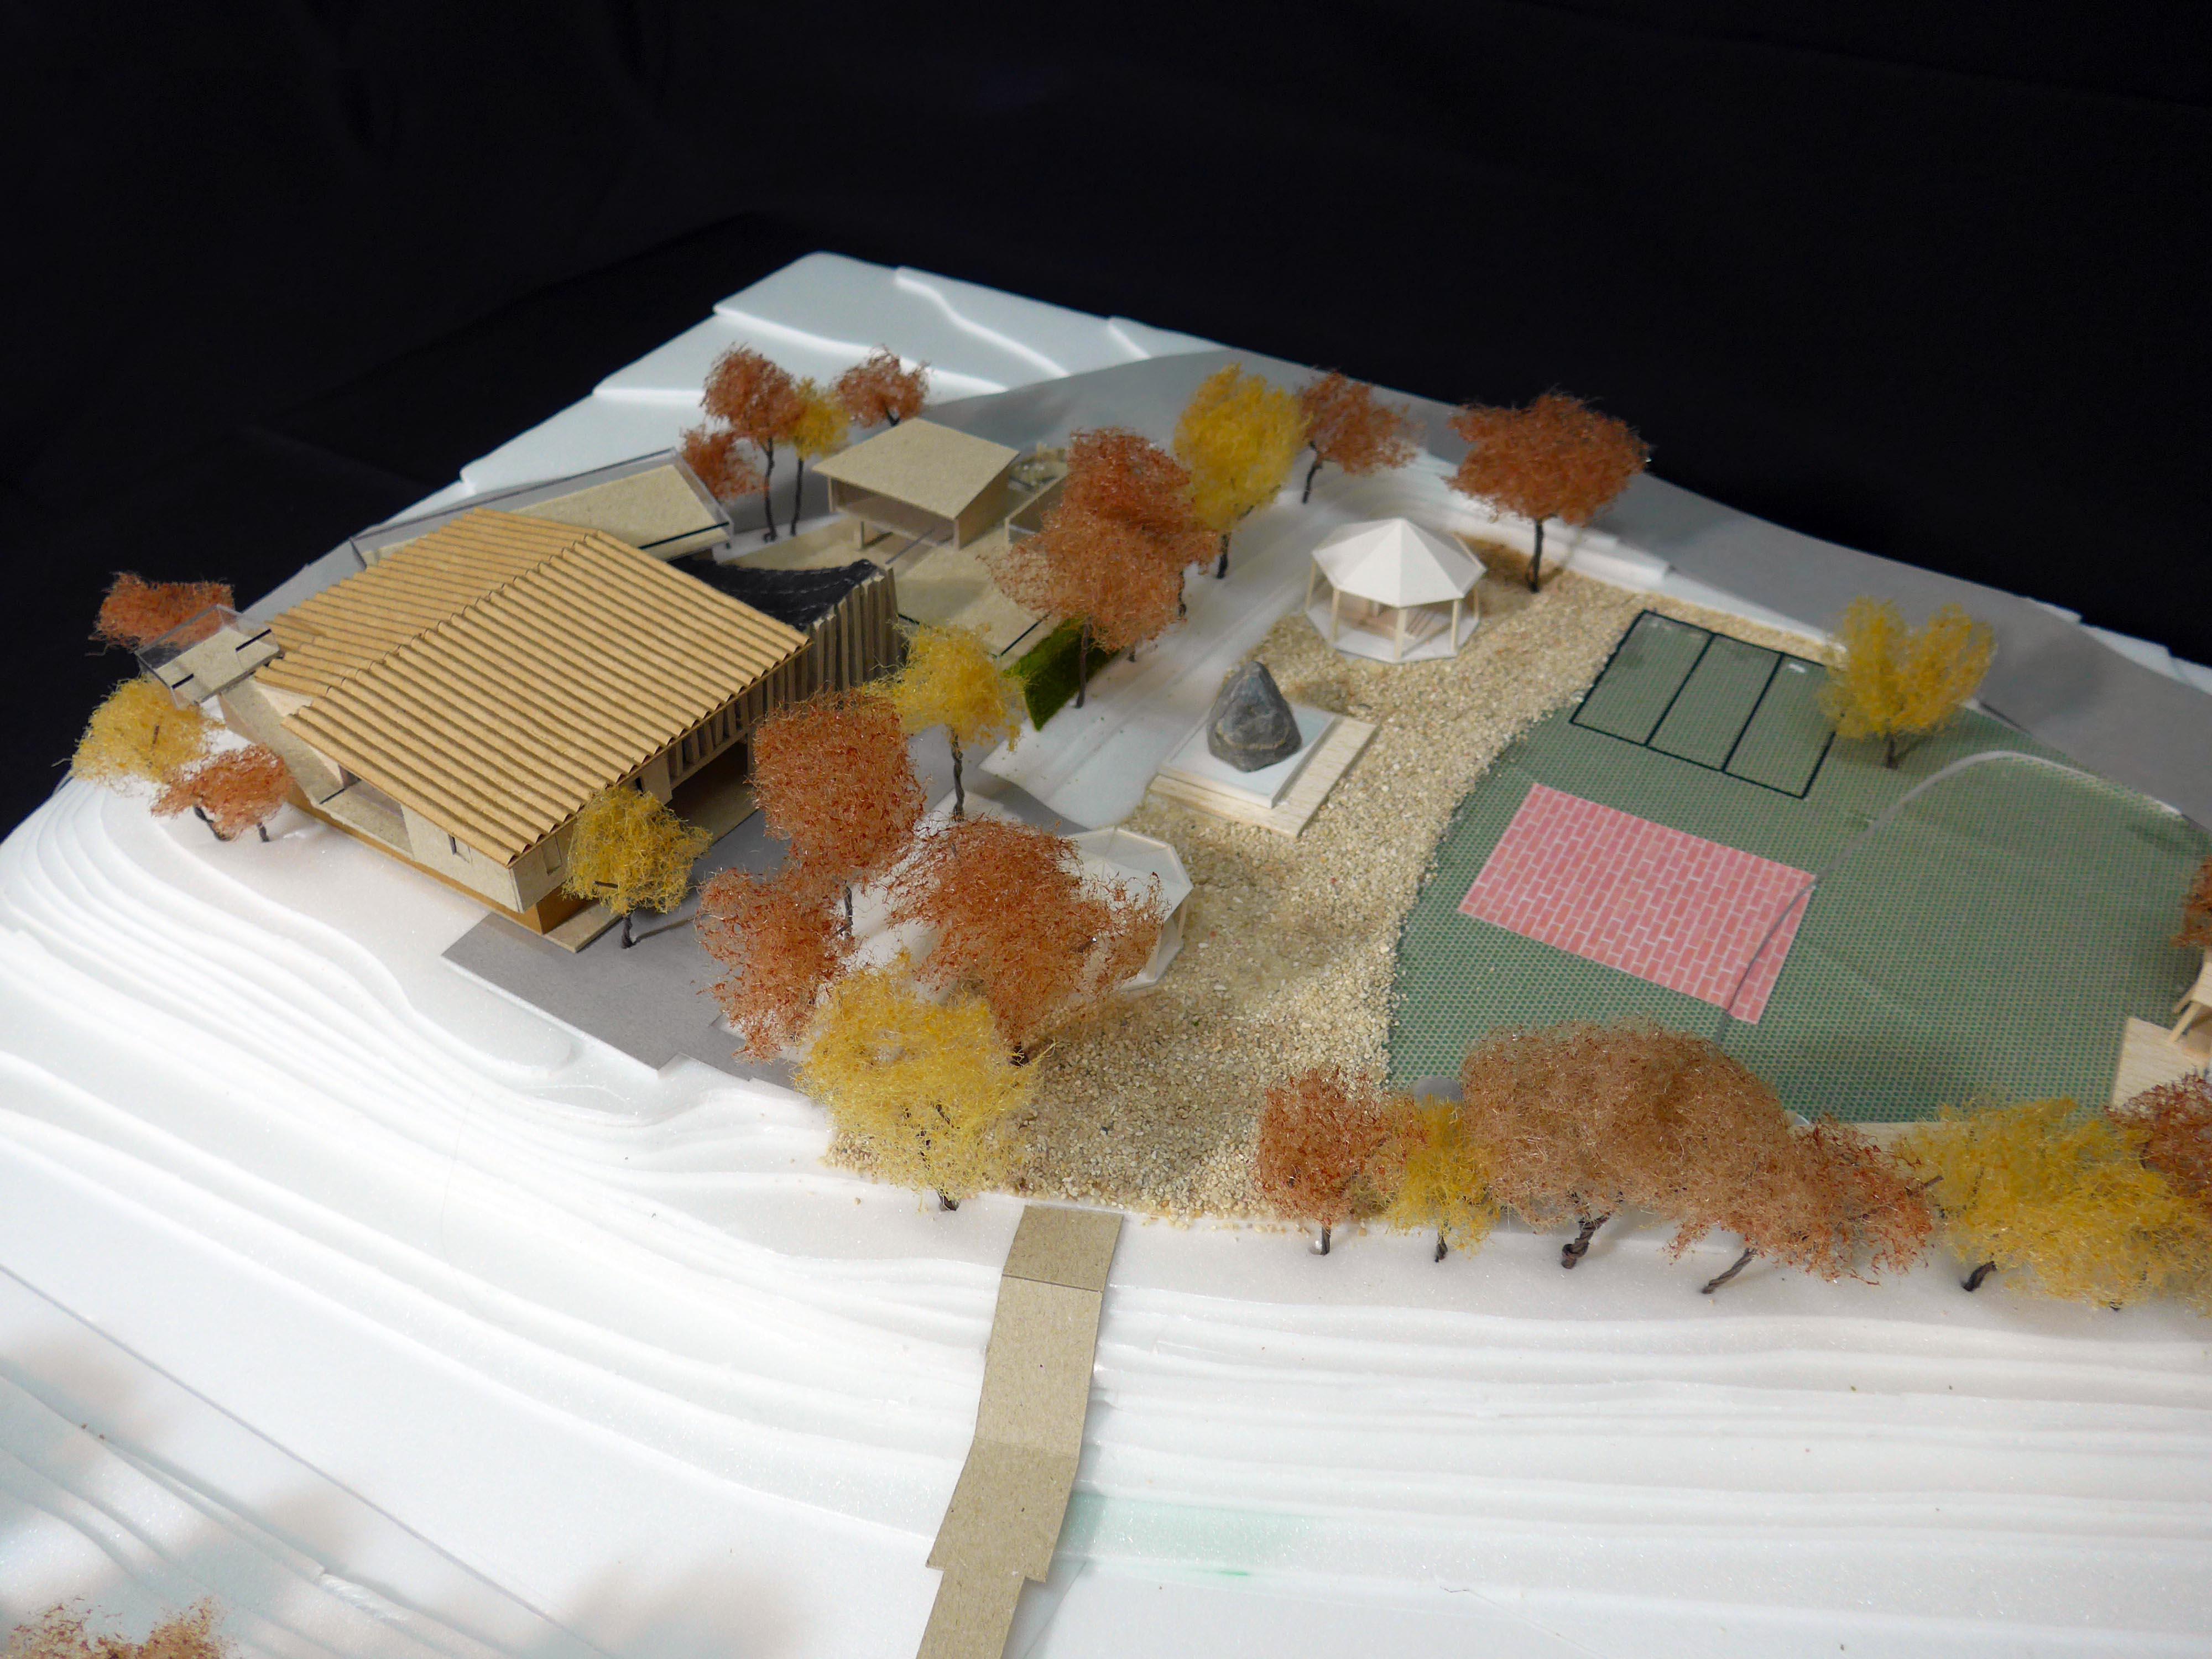 Environmental Education Hall of Hush